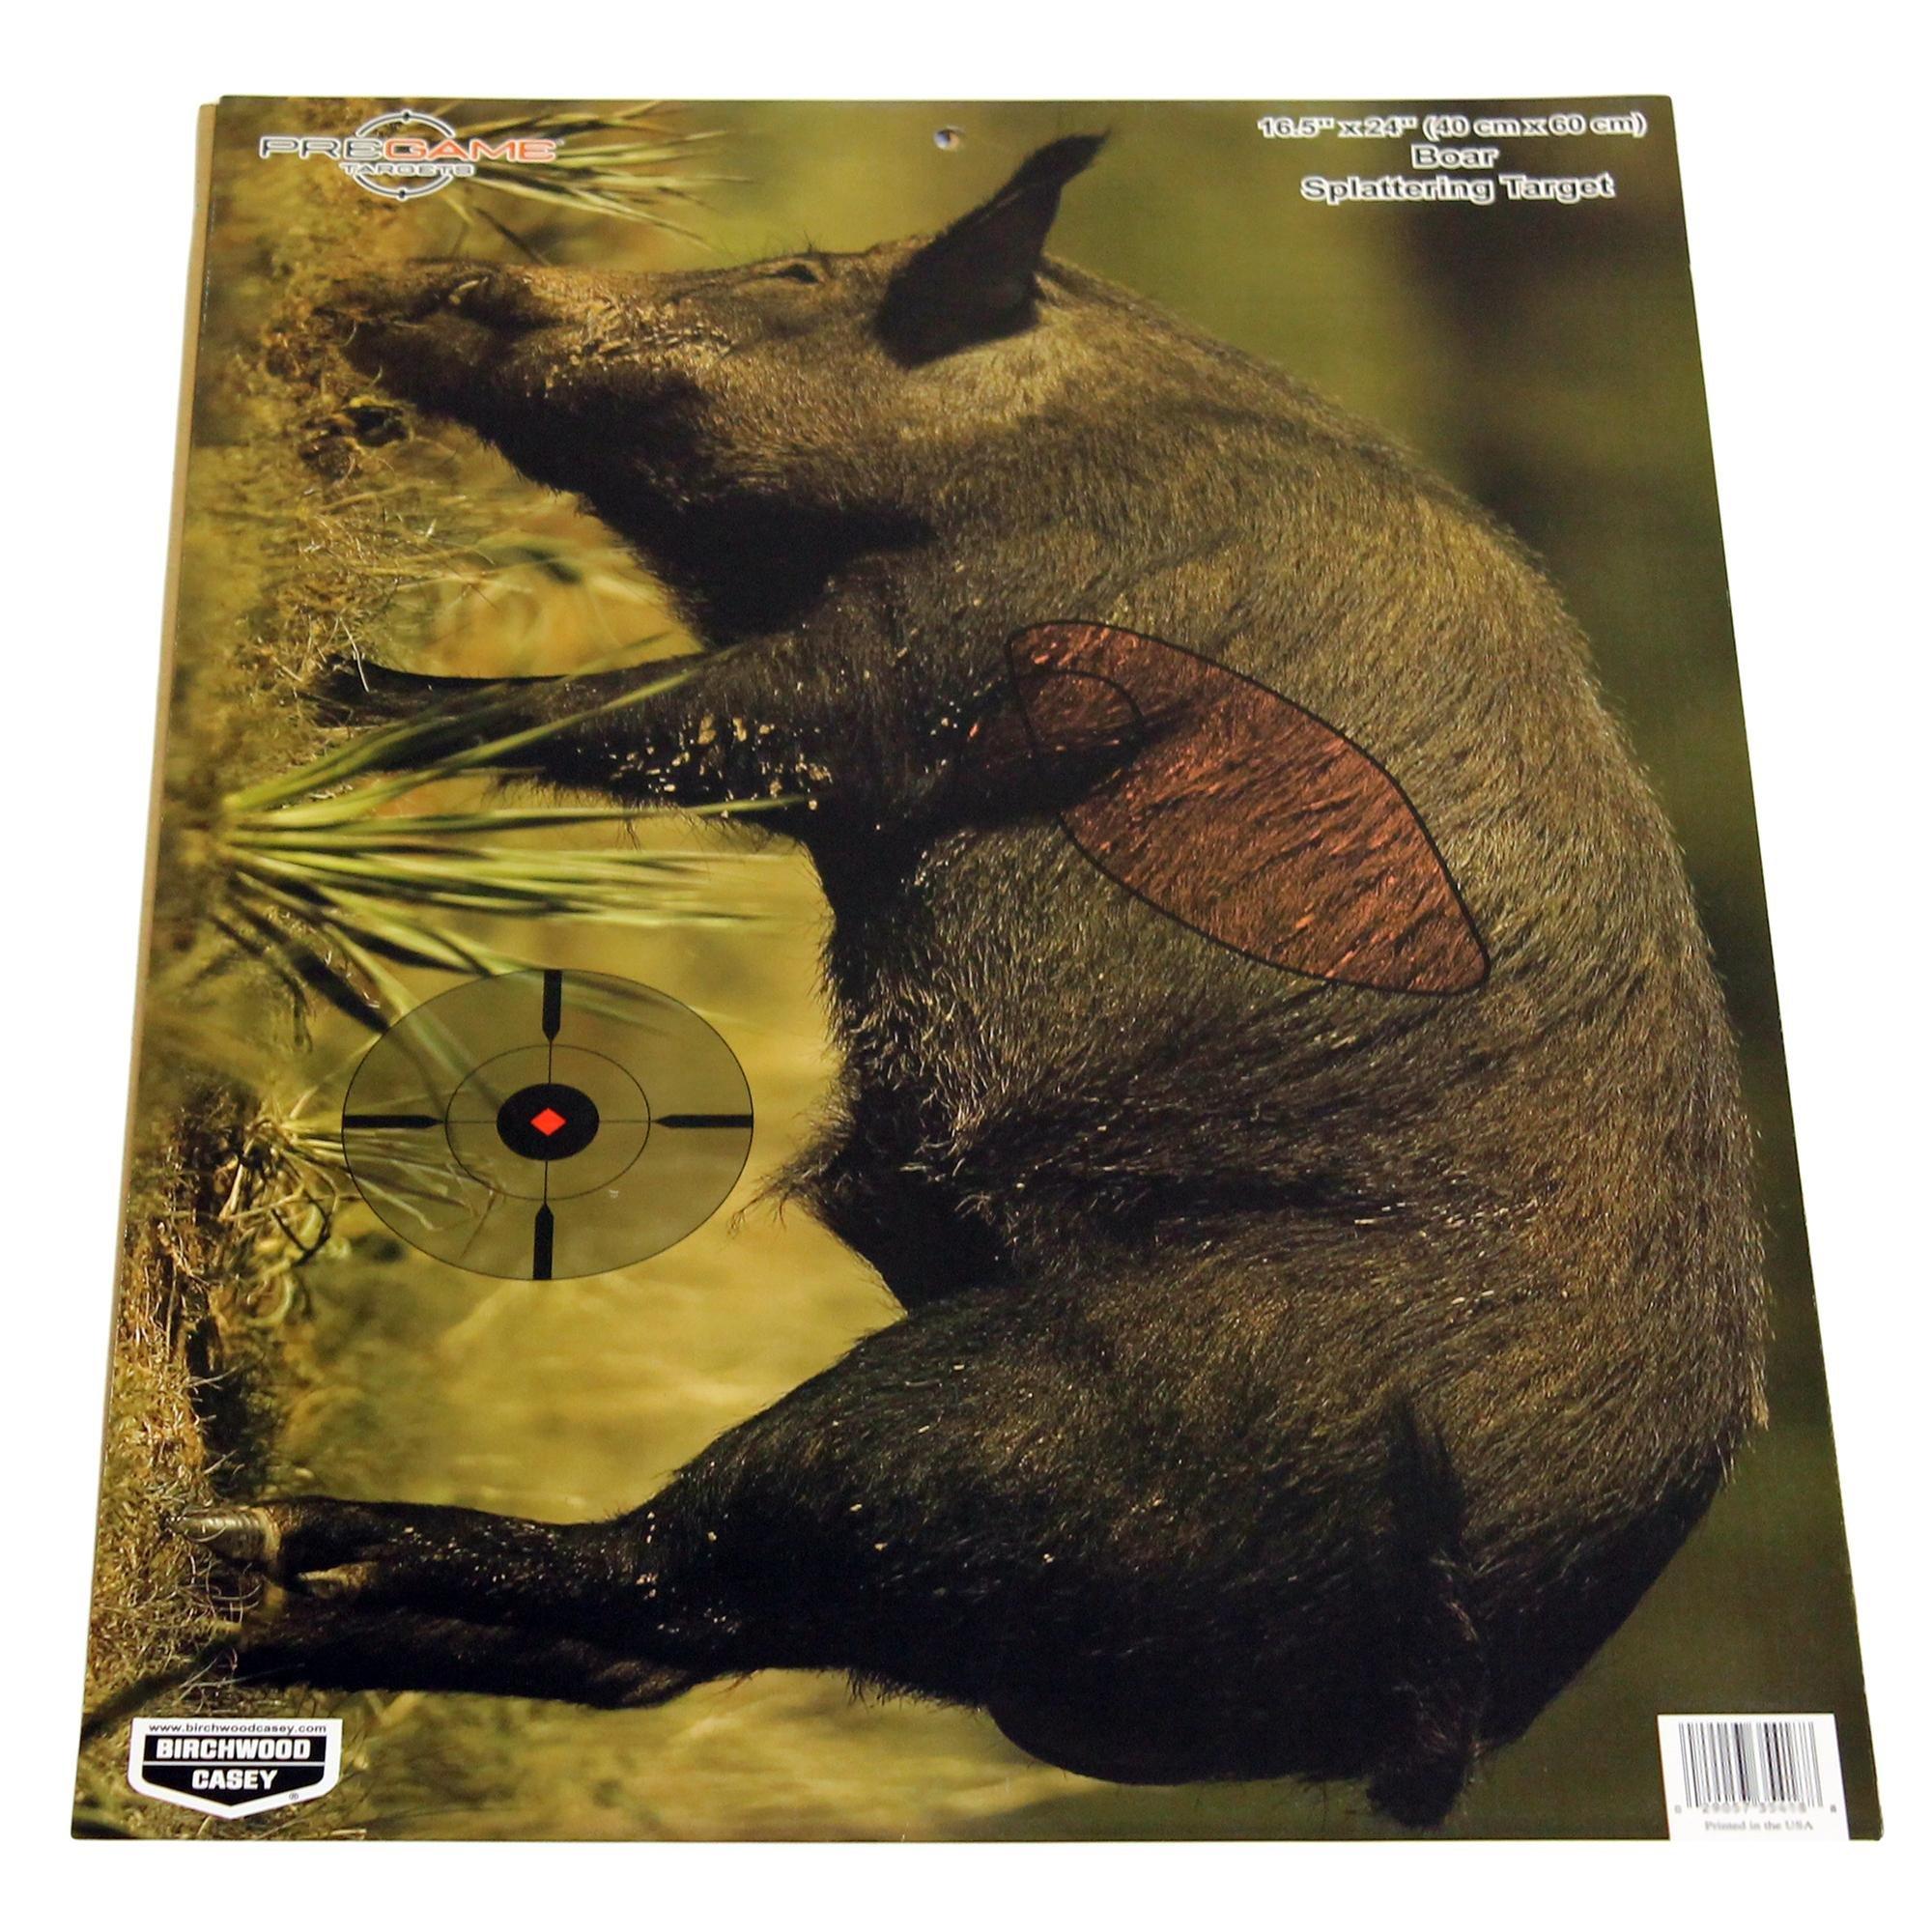 Birchwood Casey Pregame 16.5˝ x 24˝ Boar Target - 3 Targets by Birchwood Casey (Image #1)